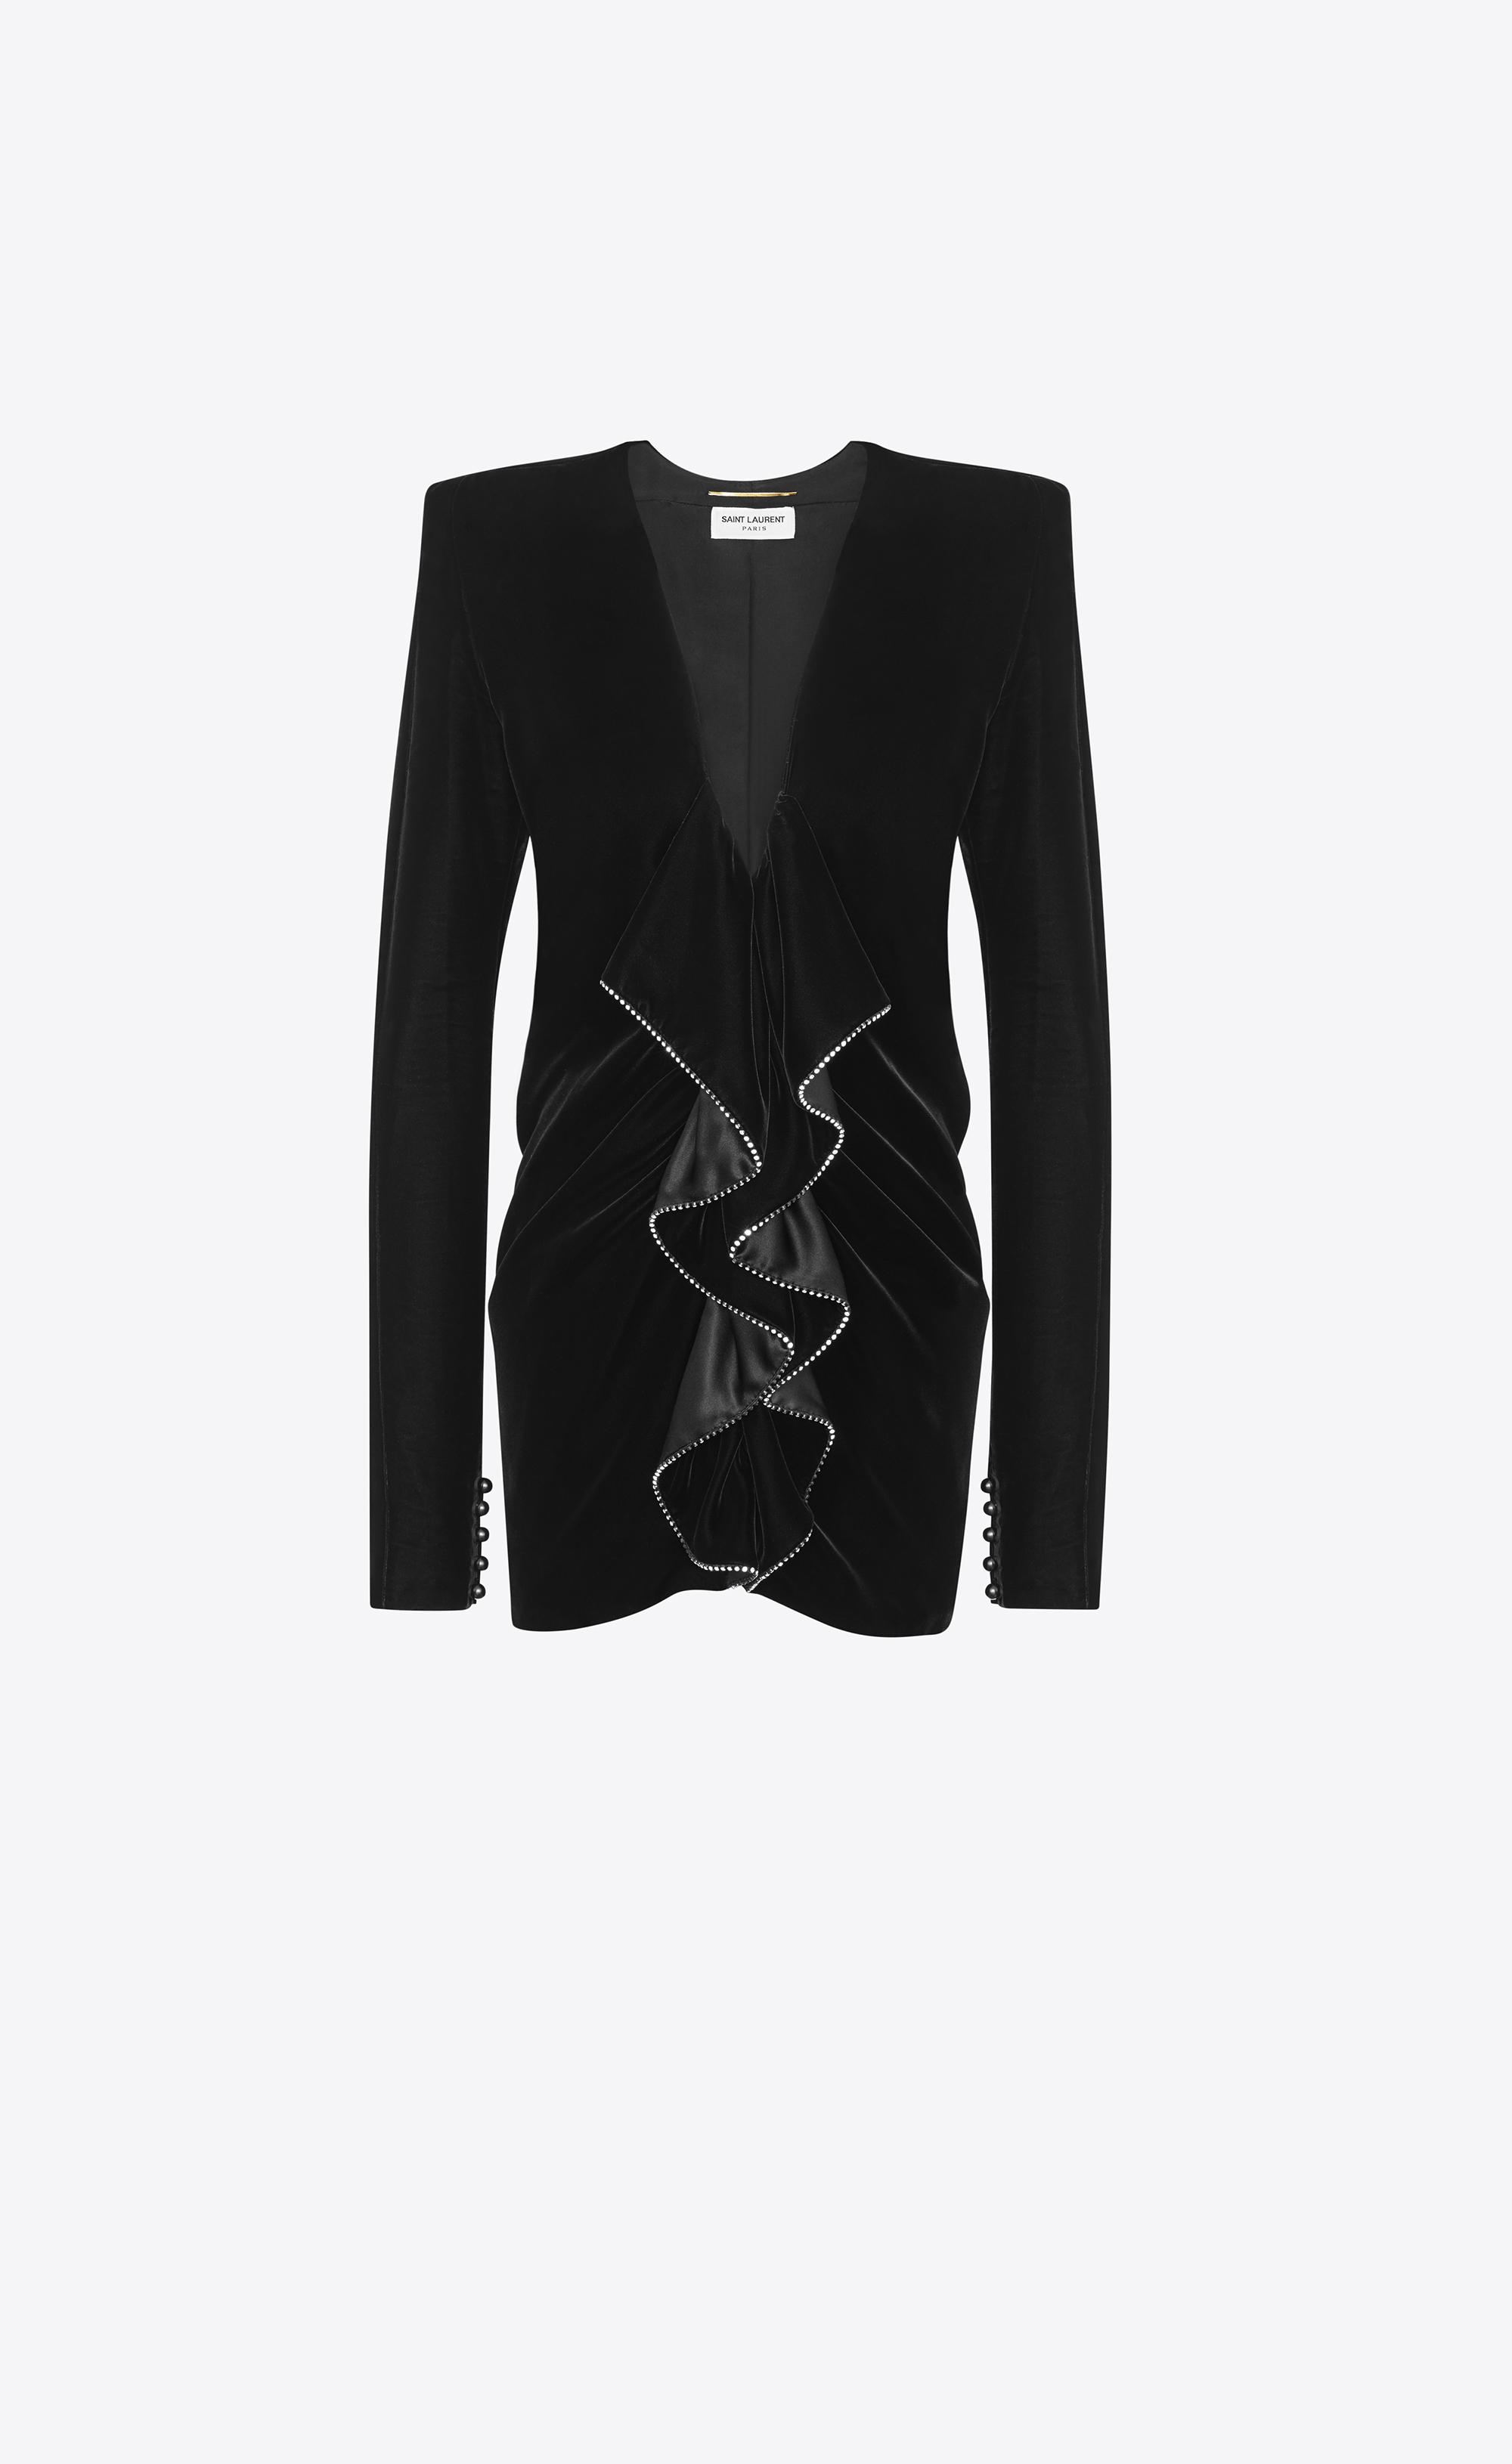 Women's Ready To Wear | Saint Laurent | YSL.com